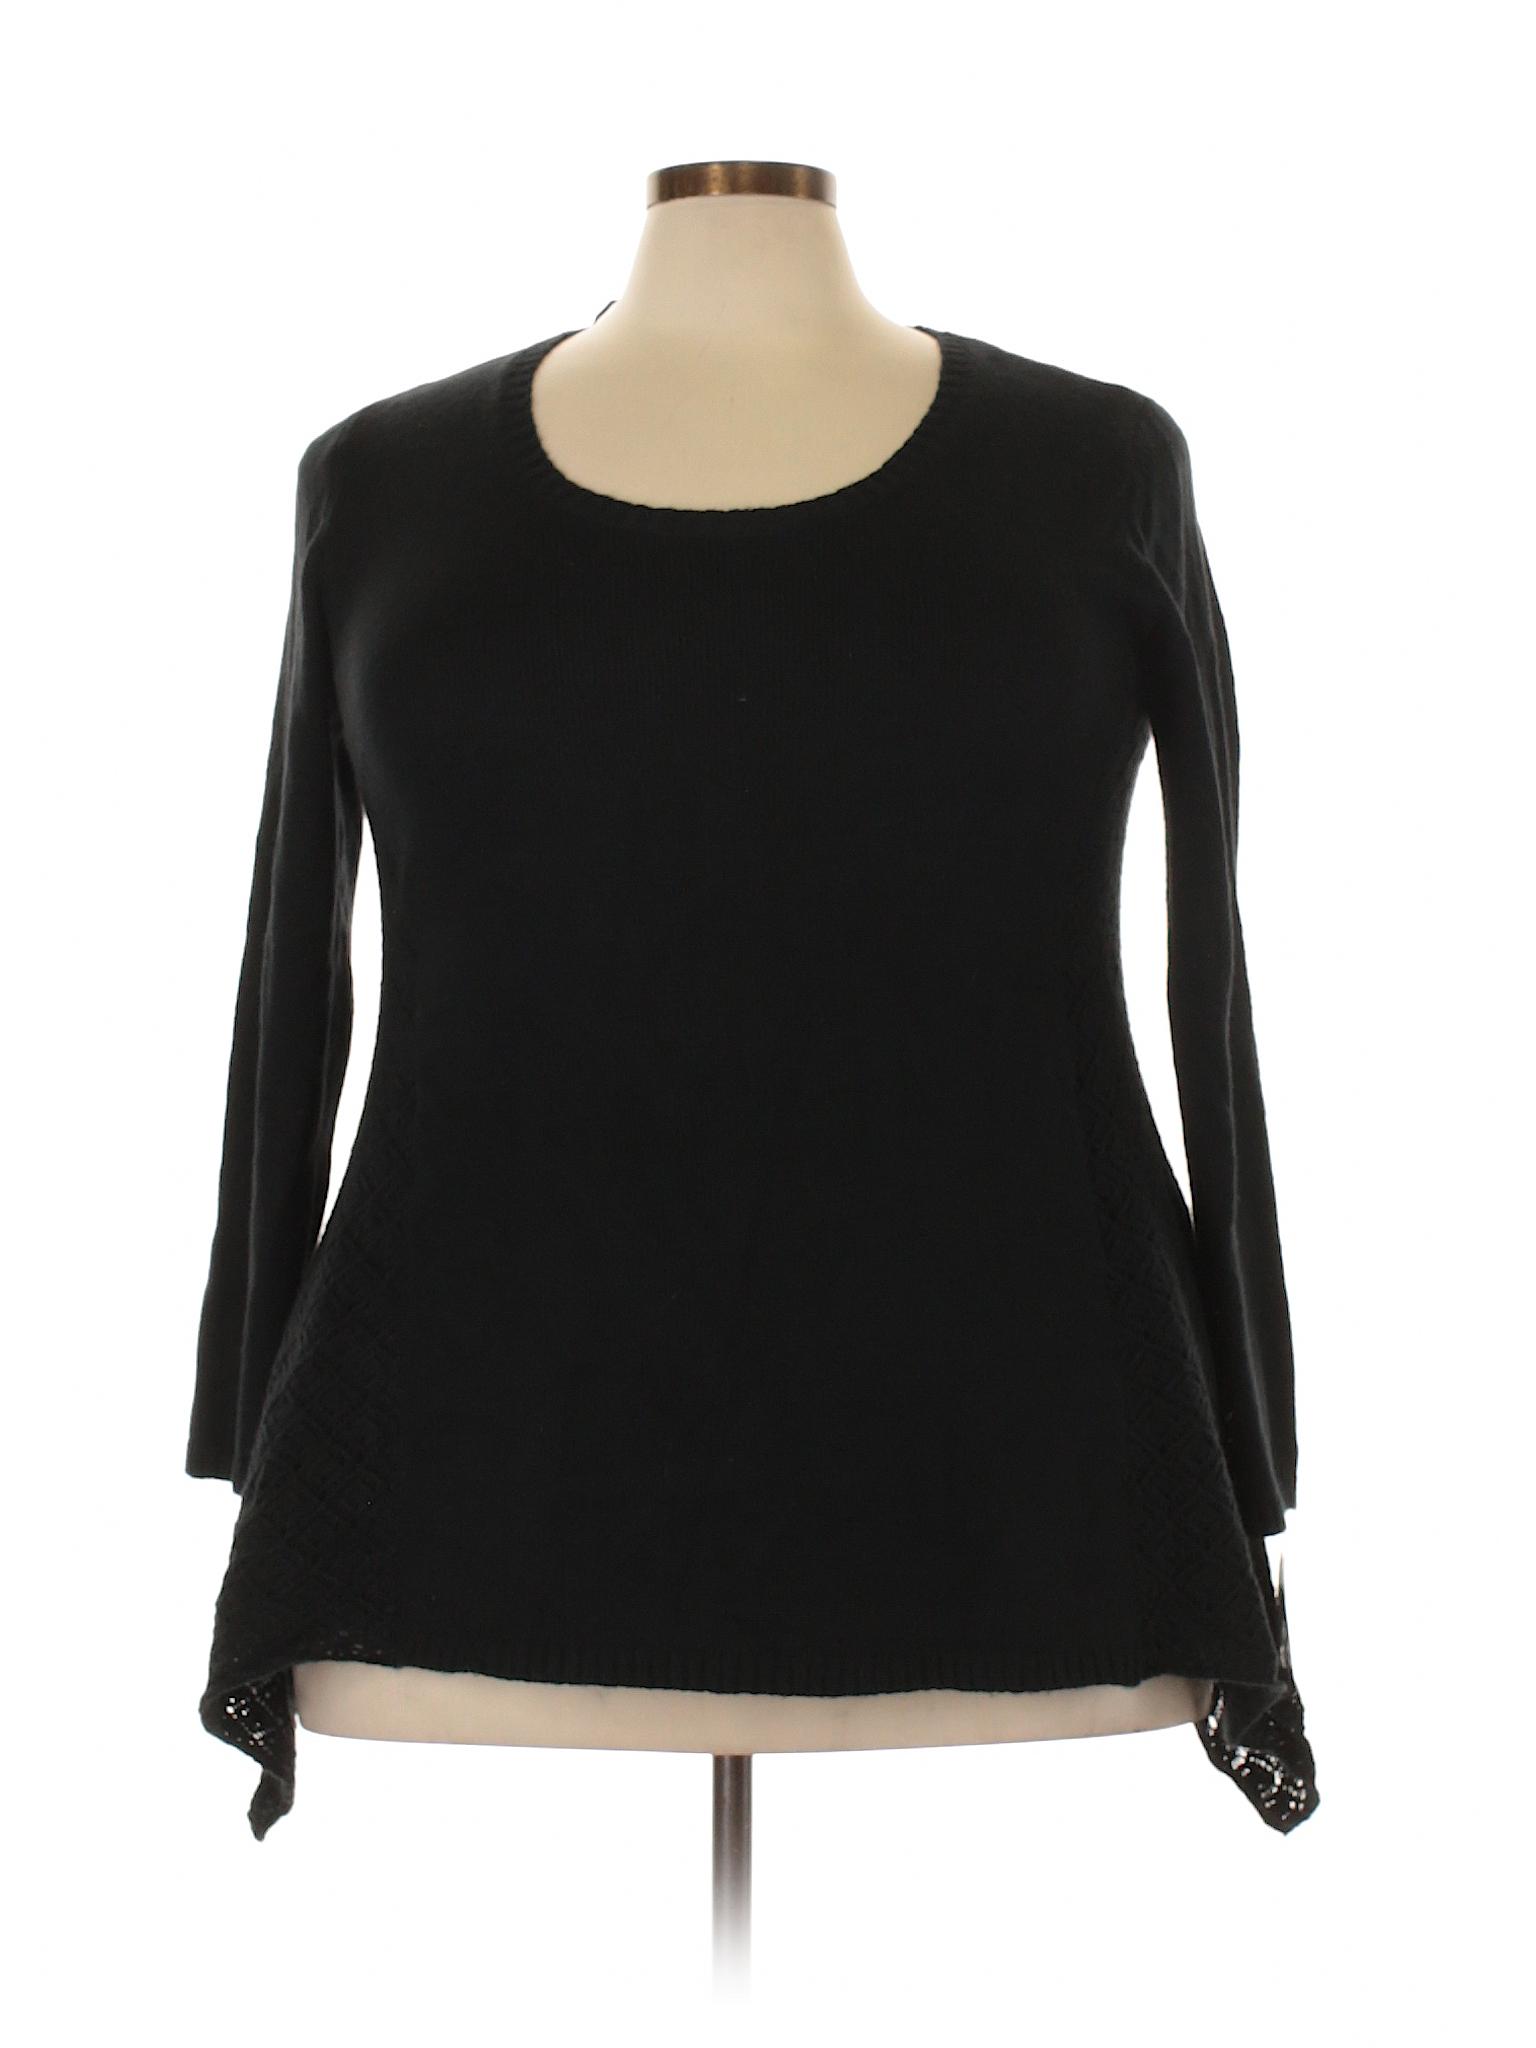 Boutique winter Pullover Style Sweater amp;Co qxfvqwSr